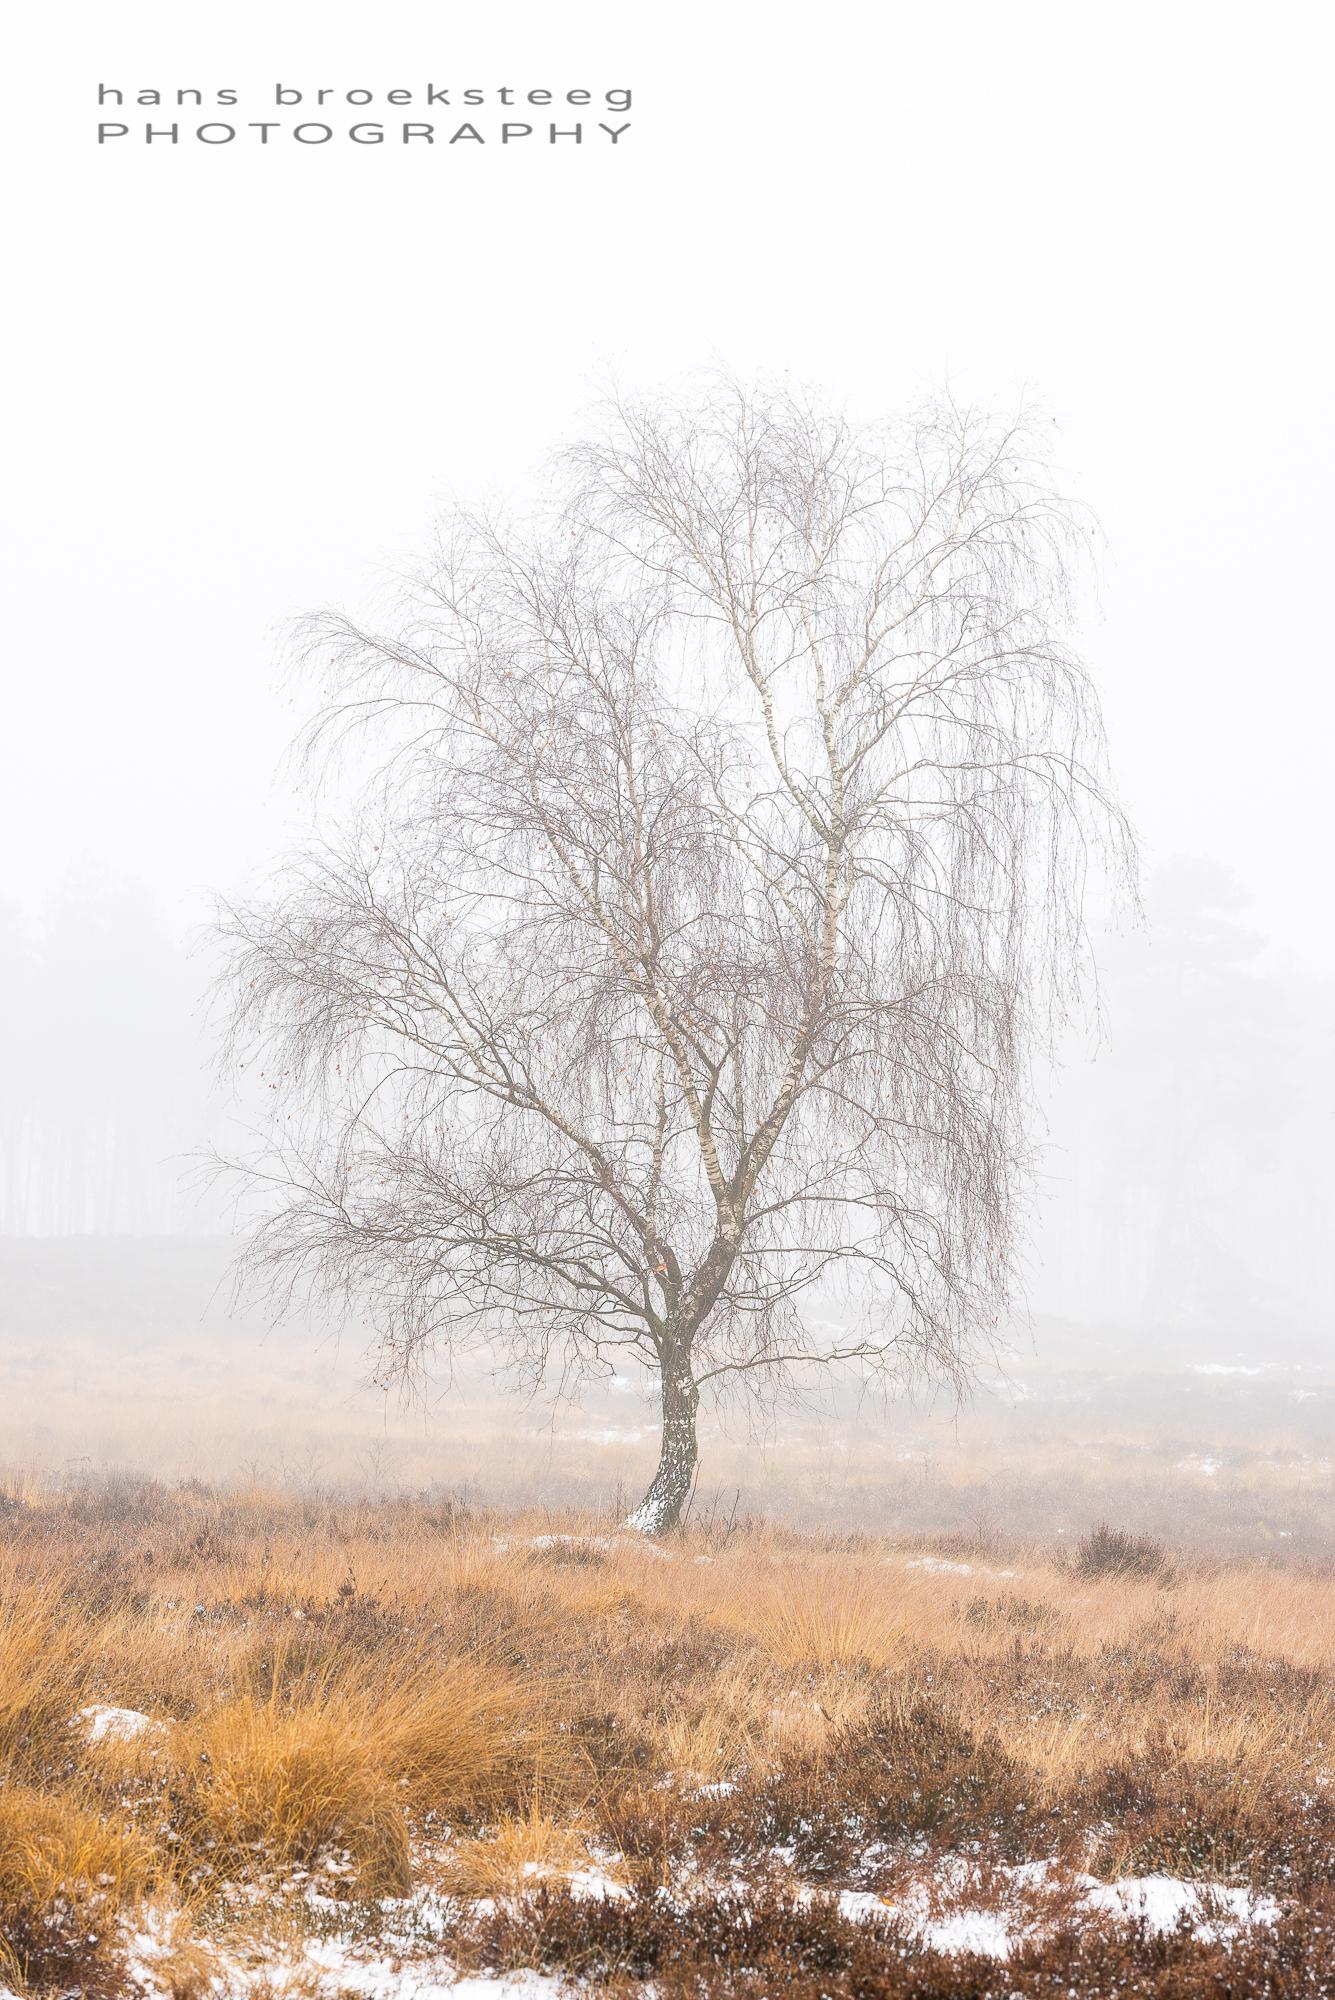 Winter scene of a lone birch tree in misty conditions